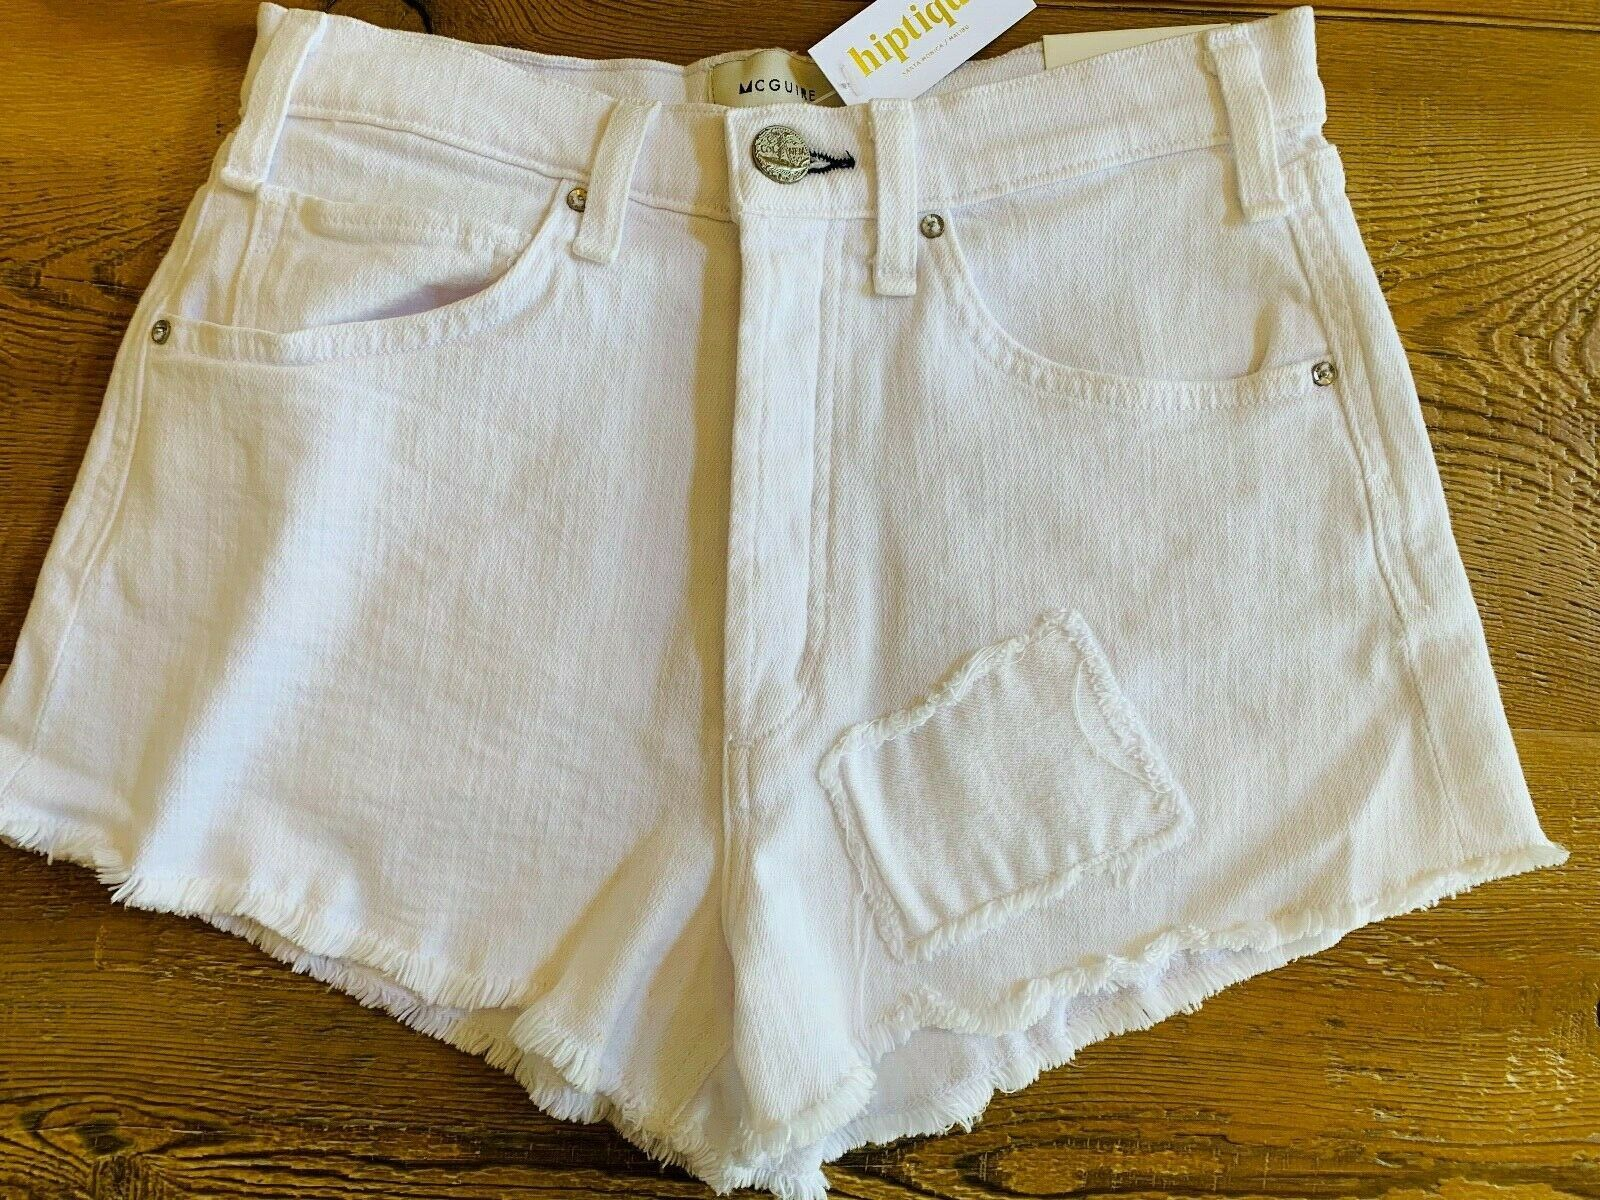 Mc Guire Georgia May Denim Shorts, White, NWT, Size 30